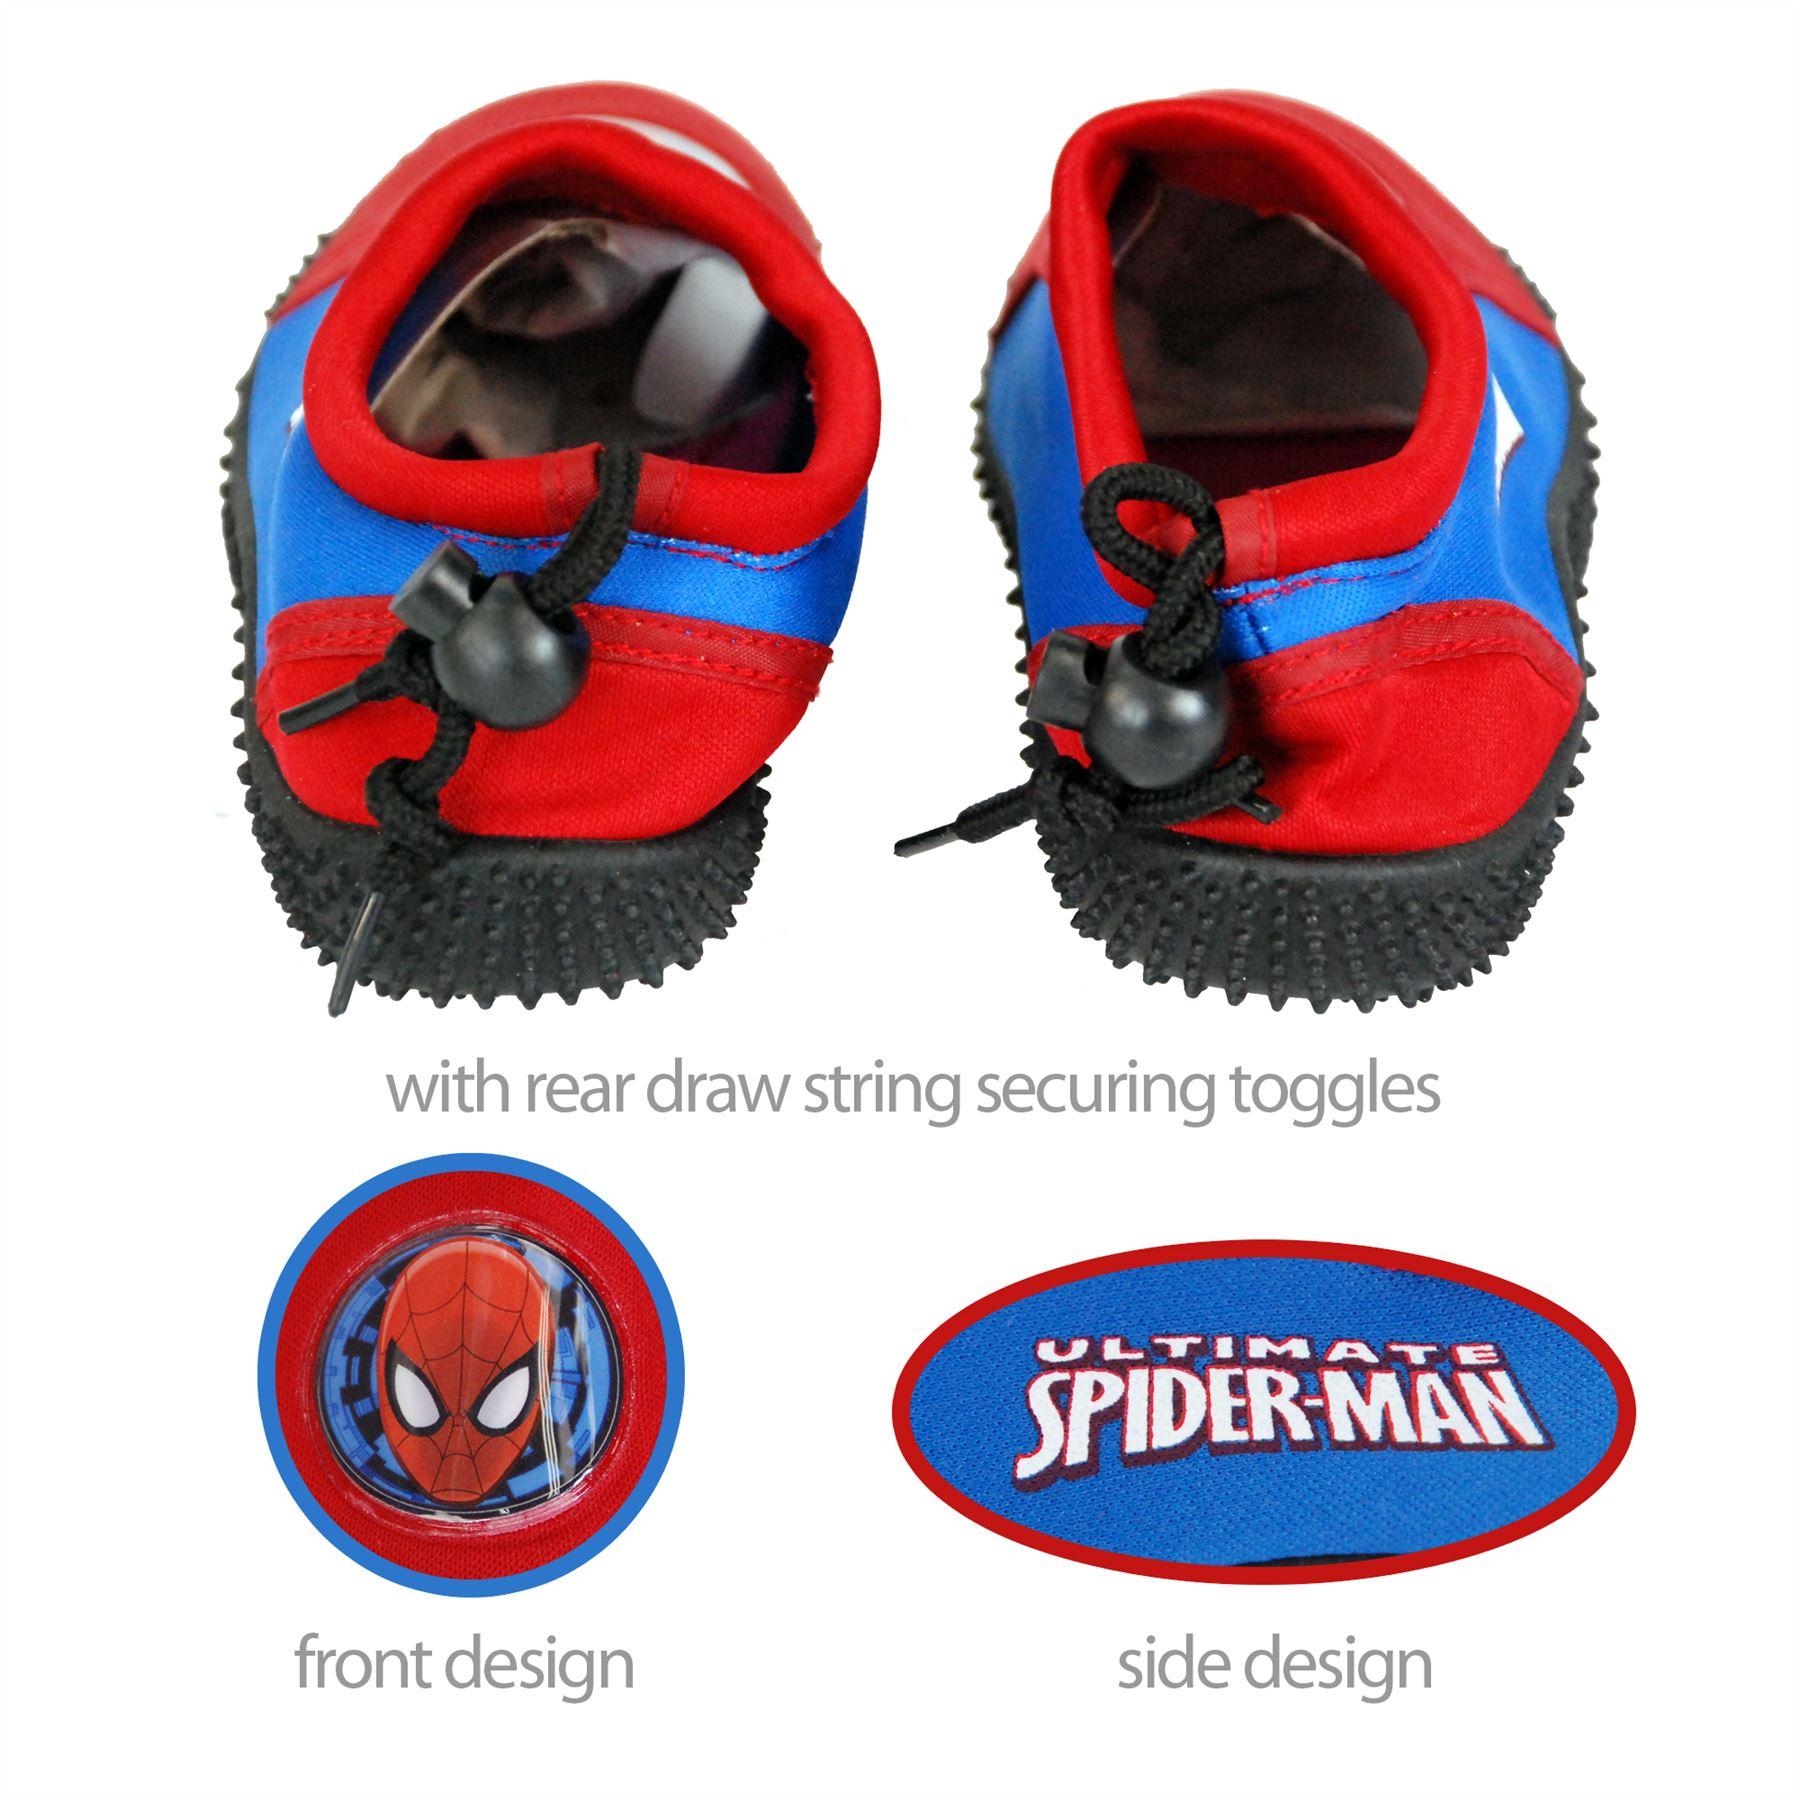 9e93a9cac Beach Pool Marvel Spider-Man Swim Shoes For Kids 9